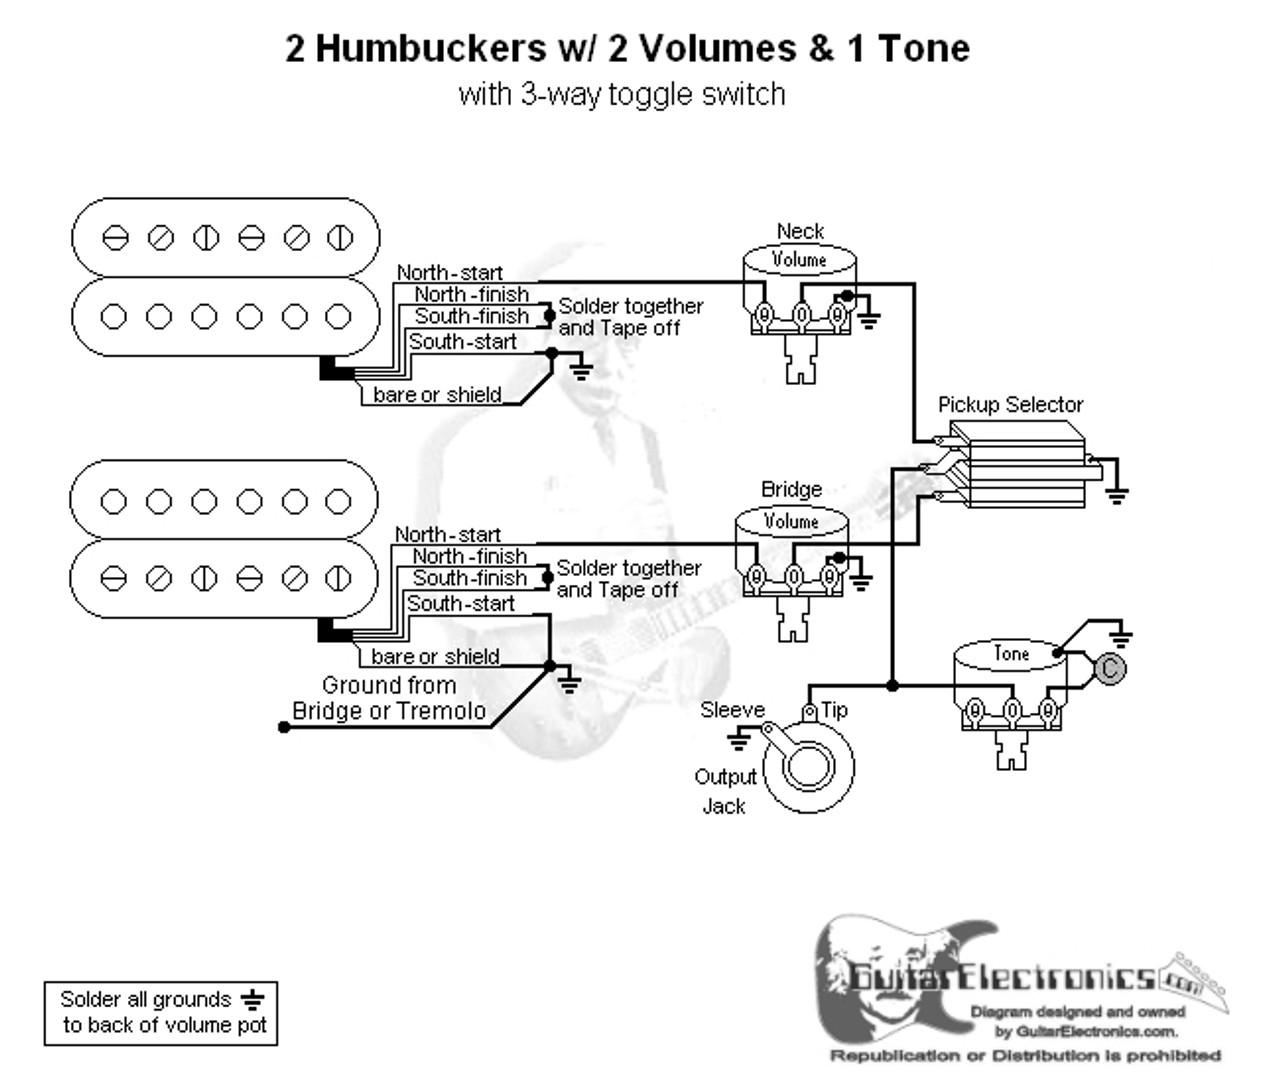 wiring diagrams for 2 humbucker 2 volume 1 tone wiring diagram toolbox single pickup guitar wiring diagram 2 humbuckers 3 way toggle switch 2 volumes 1 tone  [ 1280 x 1083 Pixel ]